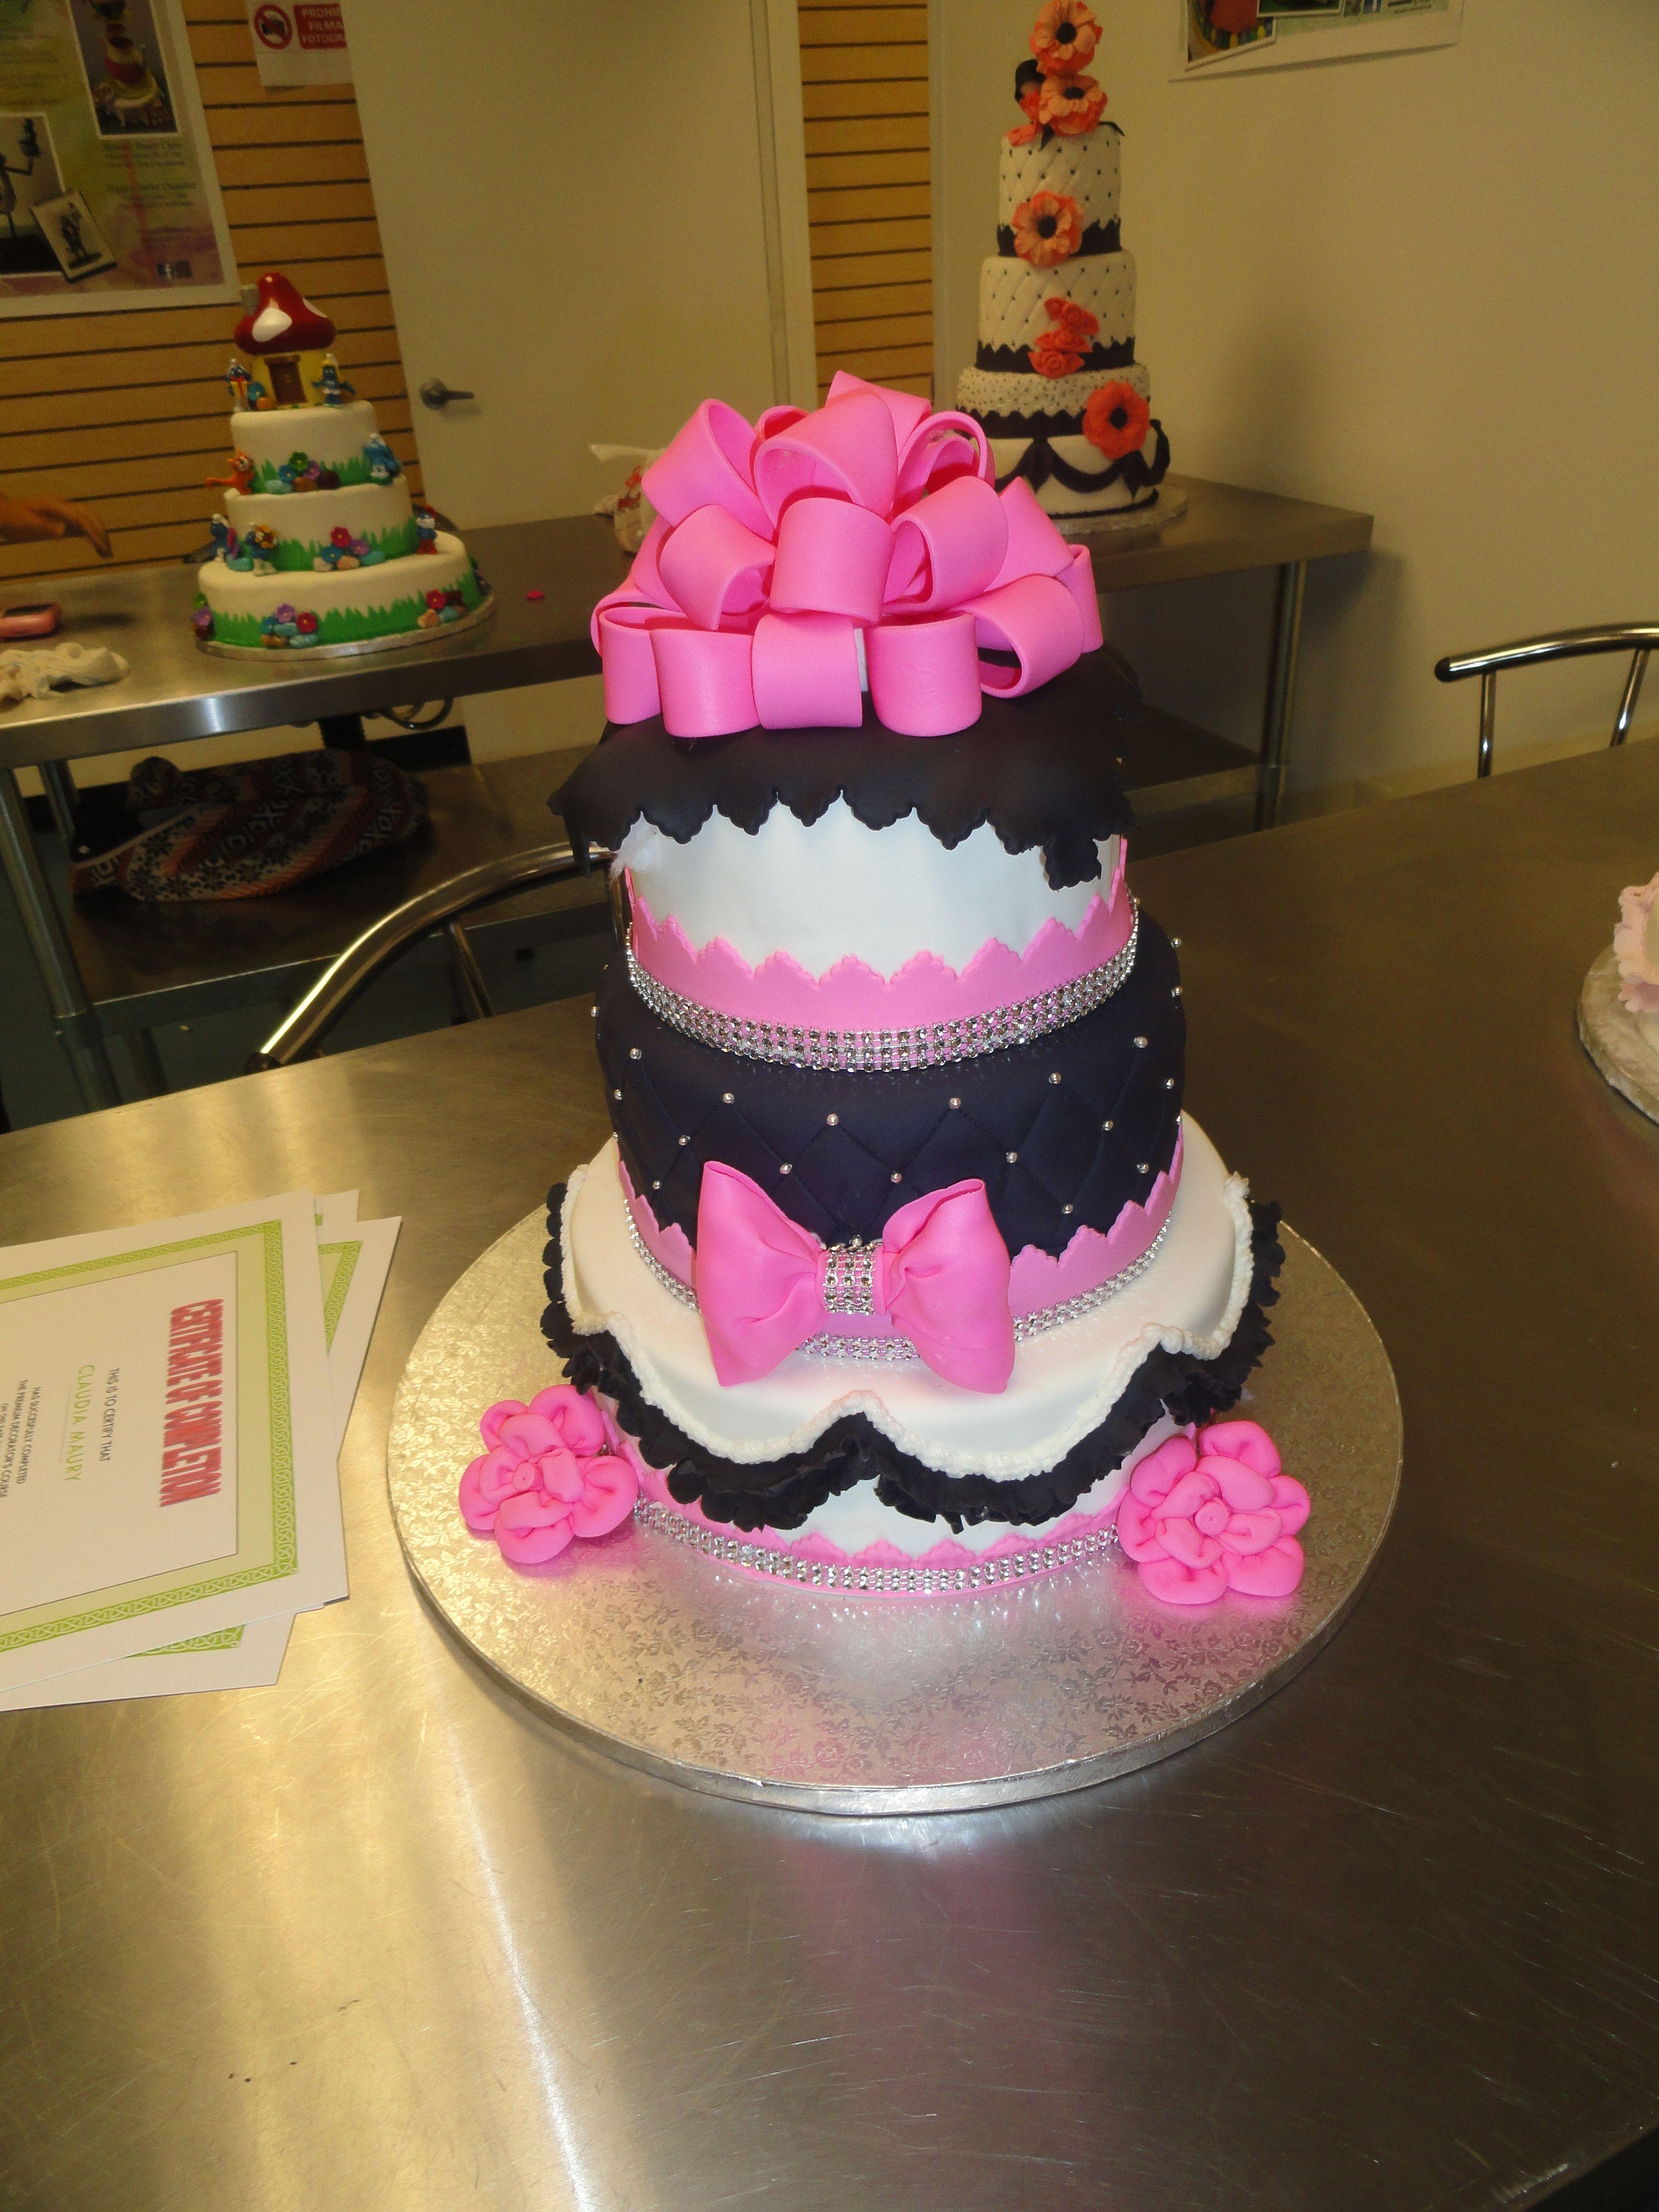 Pin Pink Bling Wedding Cakes Best Cake Cake on Pinterest